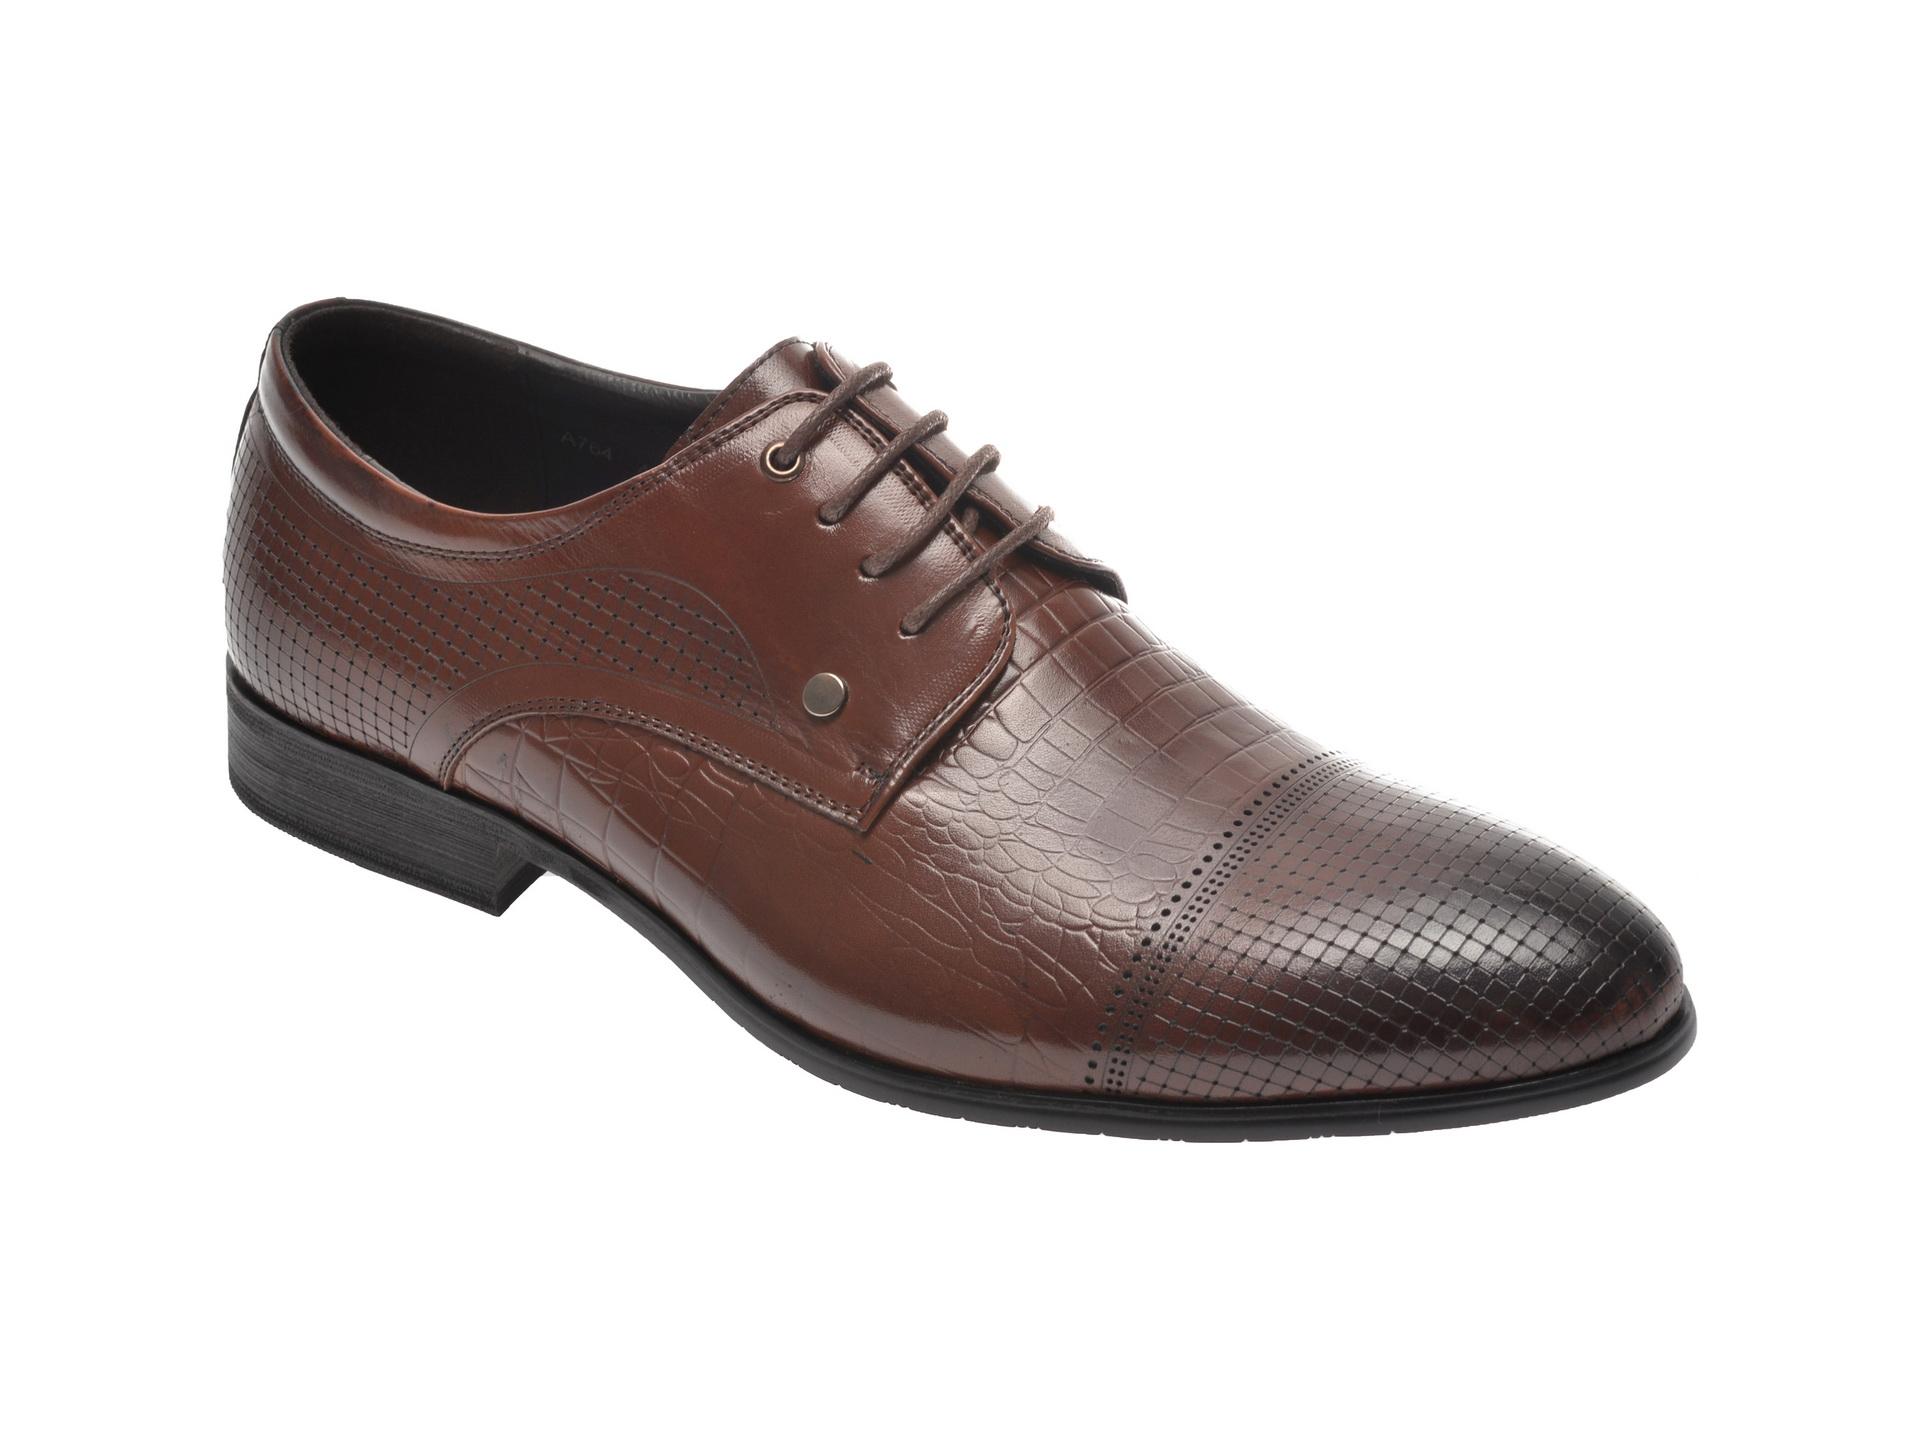 Pantofi Otter Maro, A764, Din Piele Naturala